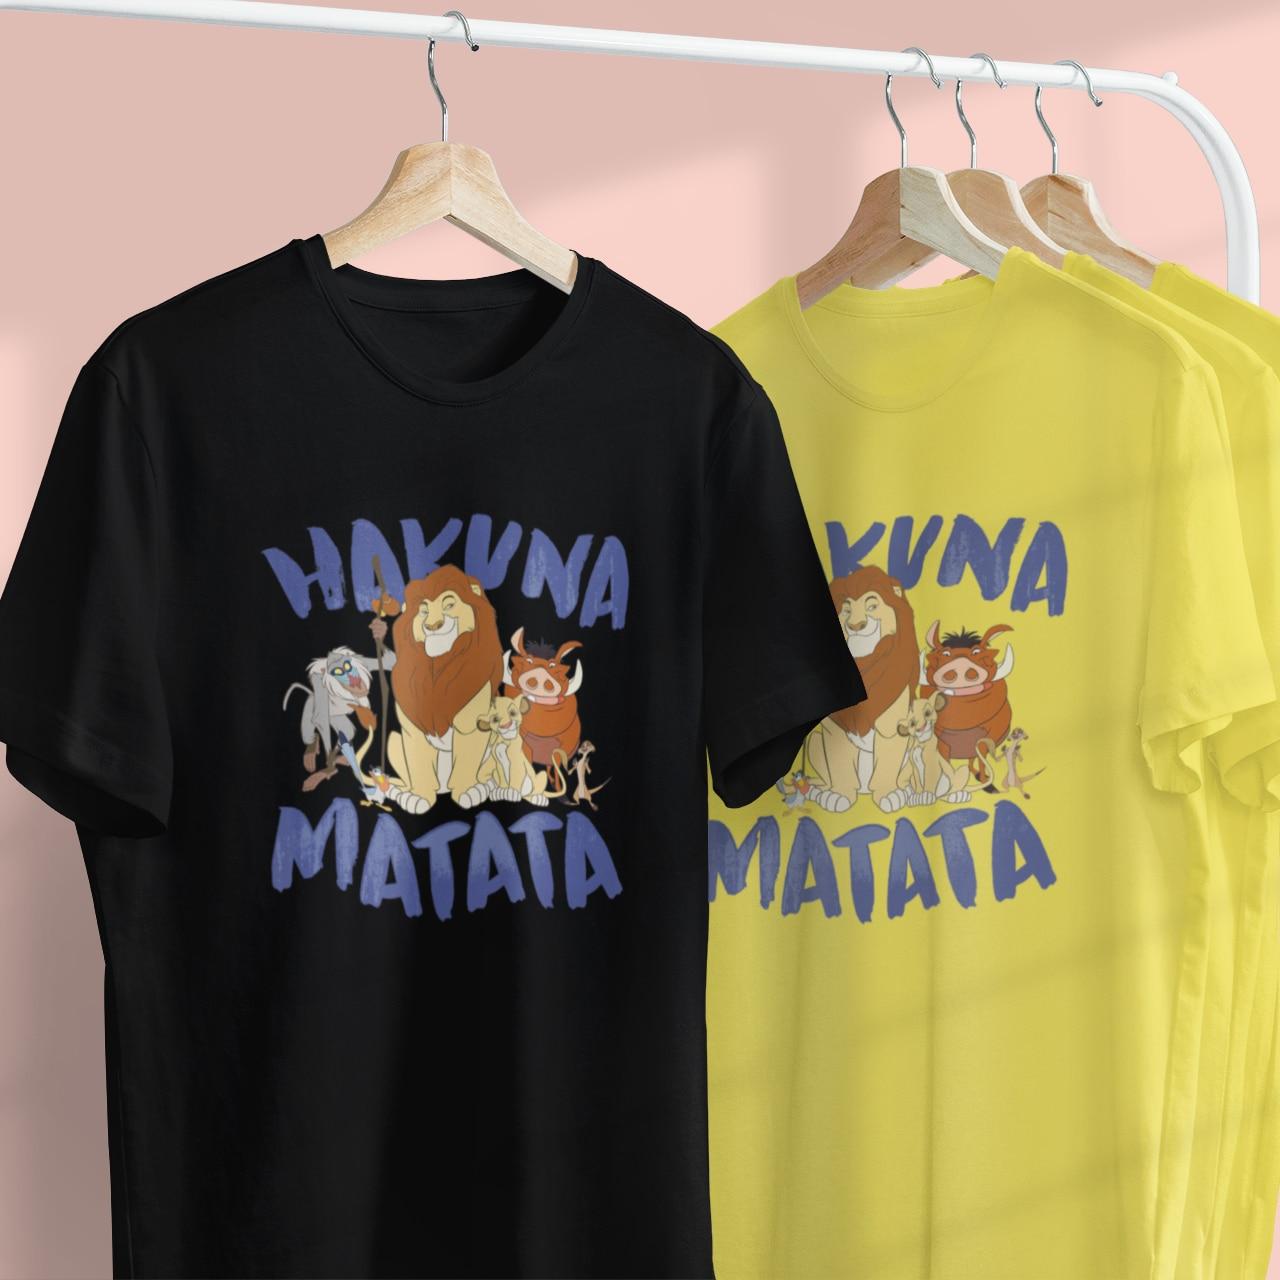 5 Colors HAKUNA MATATA Women T-shirt Summer Cute The Lion King Print Funny Casual Female Tshirt Tees Disney Tops